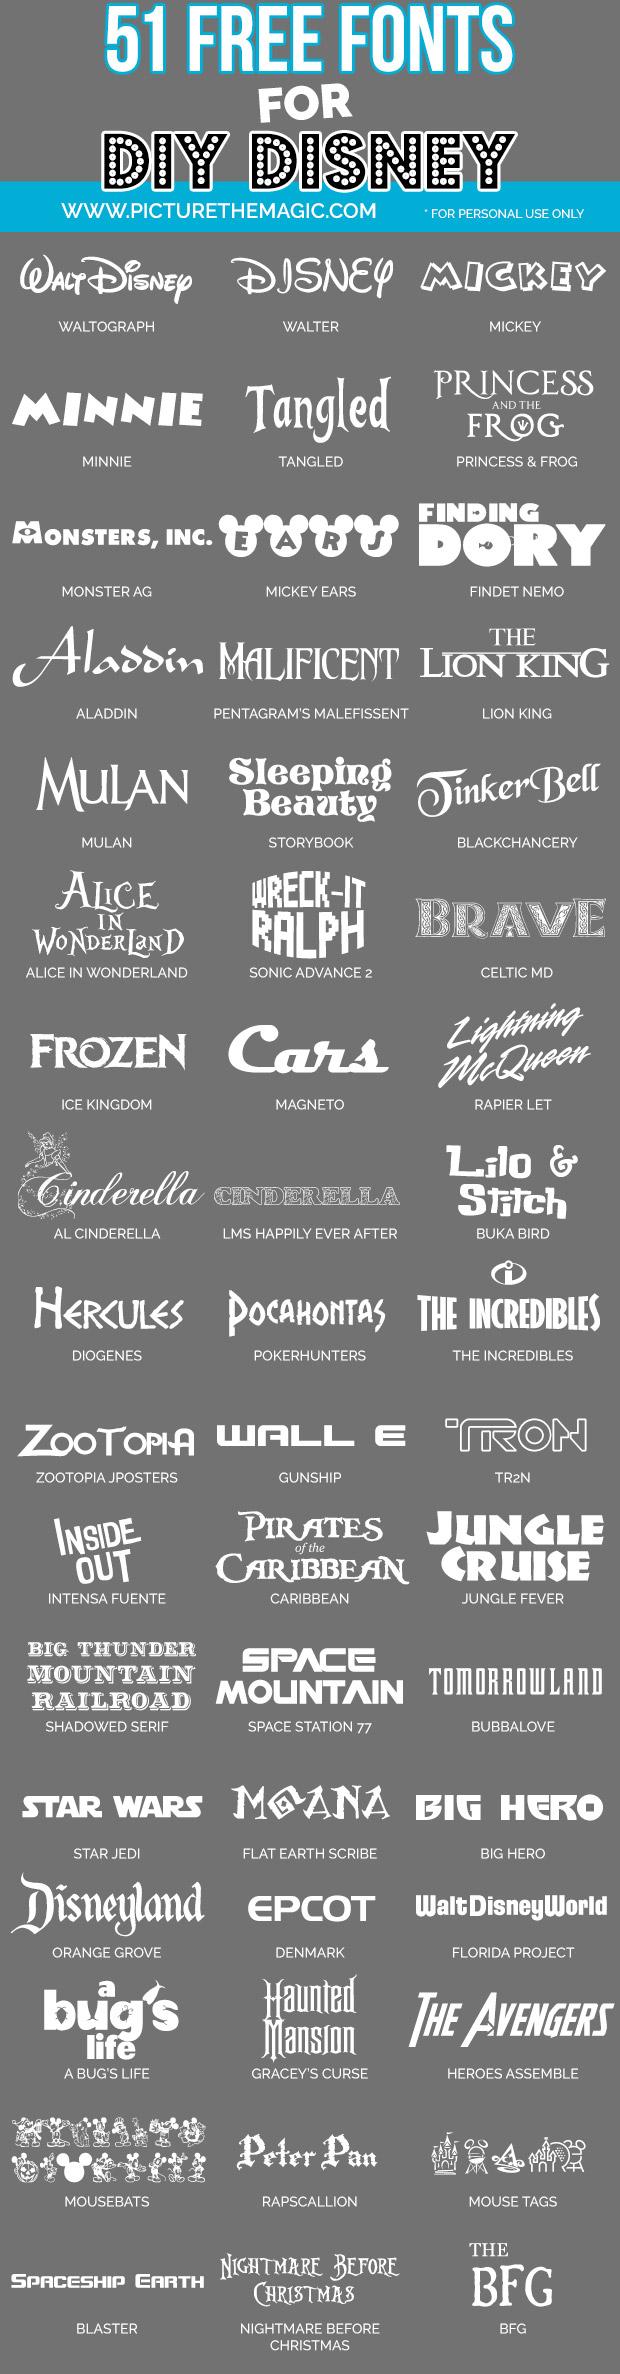 101 Disney Freebies June 2017 Edition Free Disney Stuff